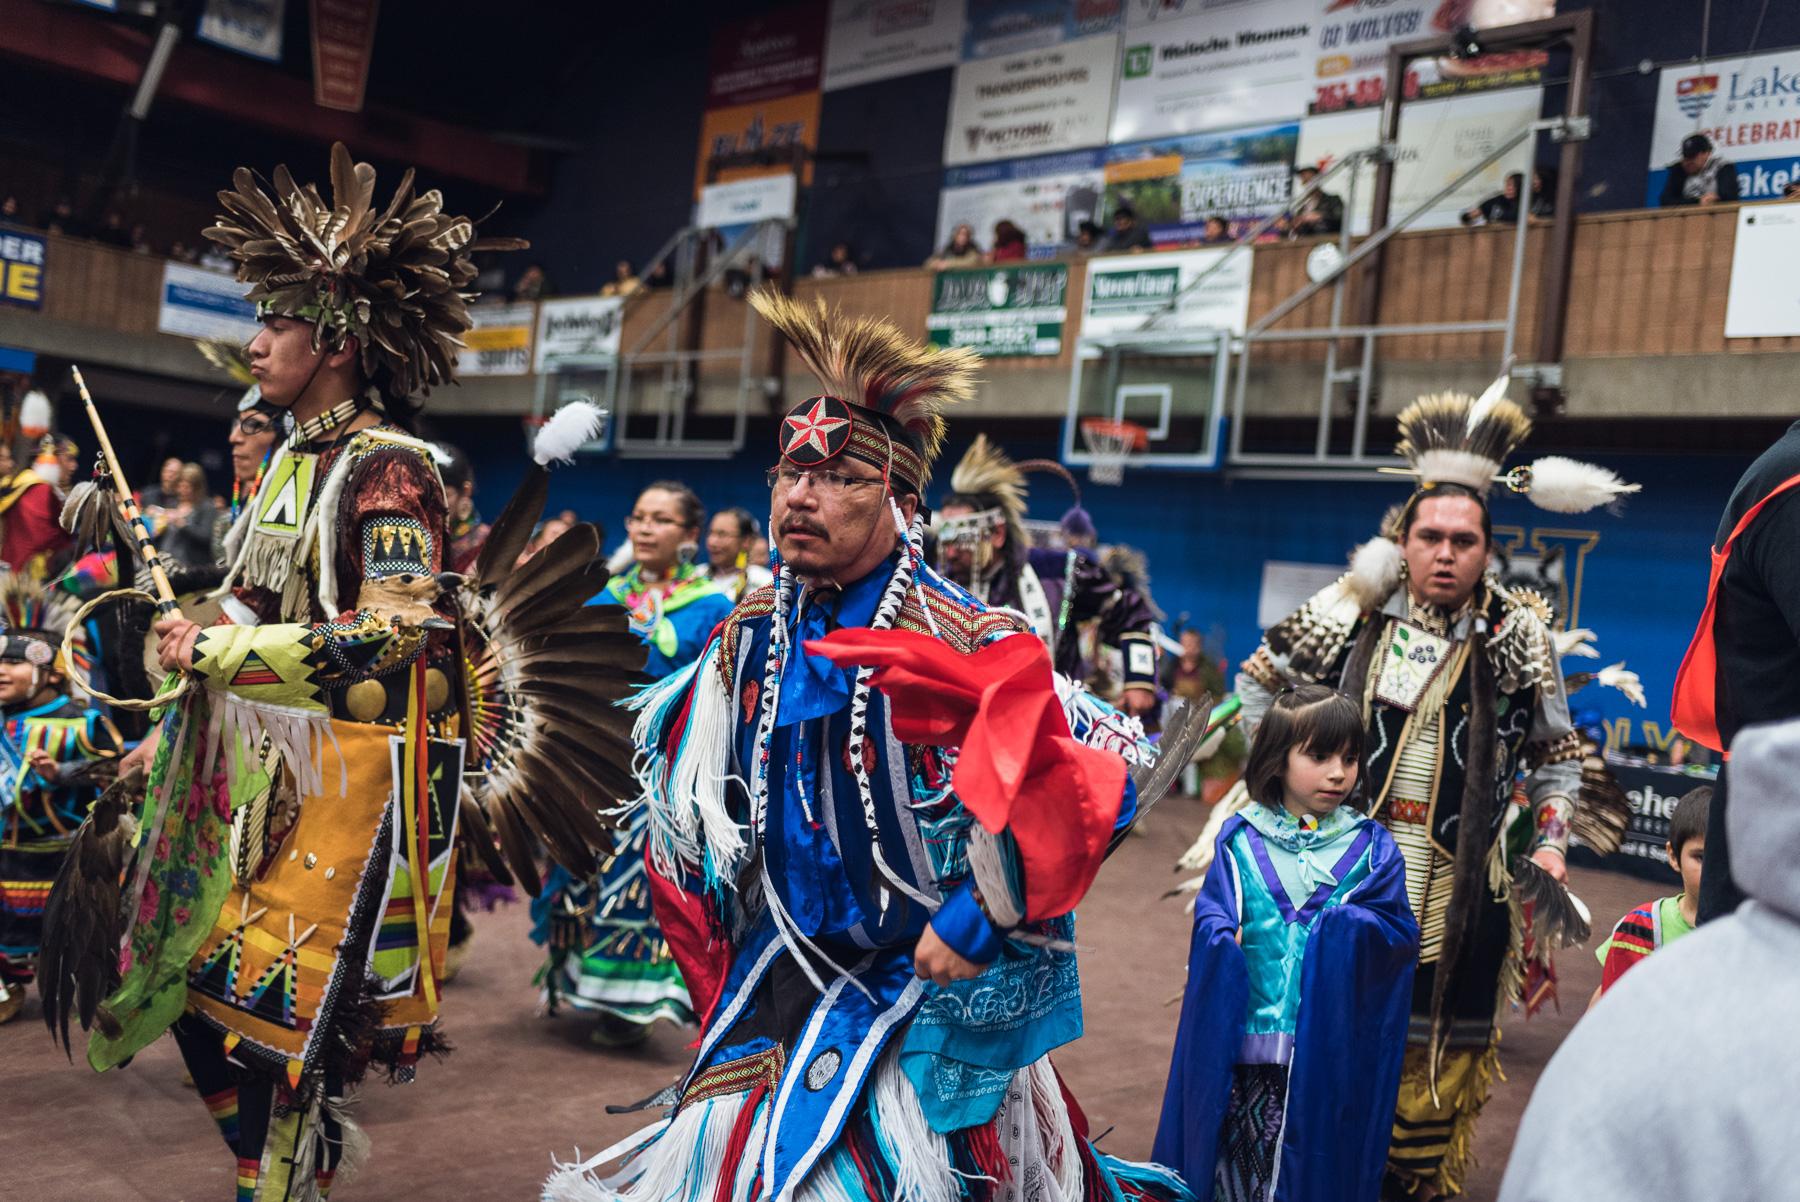 31st-Annual-LUNSA-Powwow-Blog-107.jpg